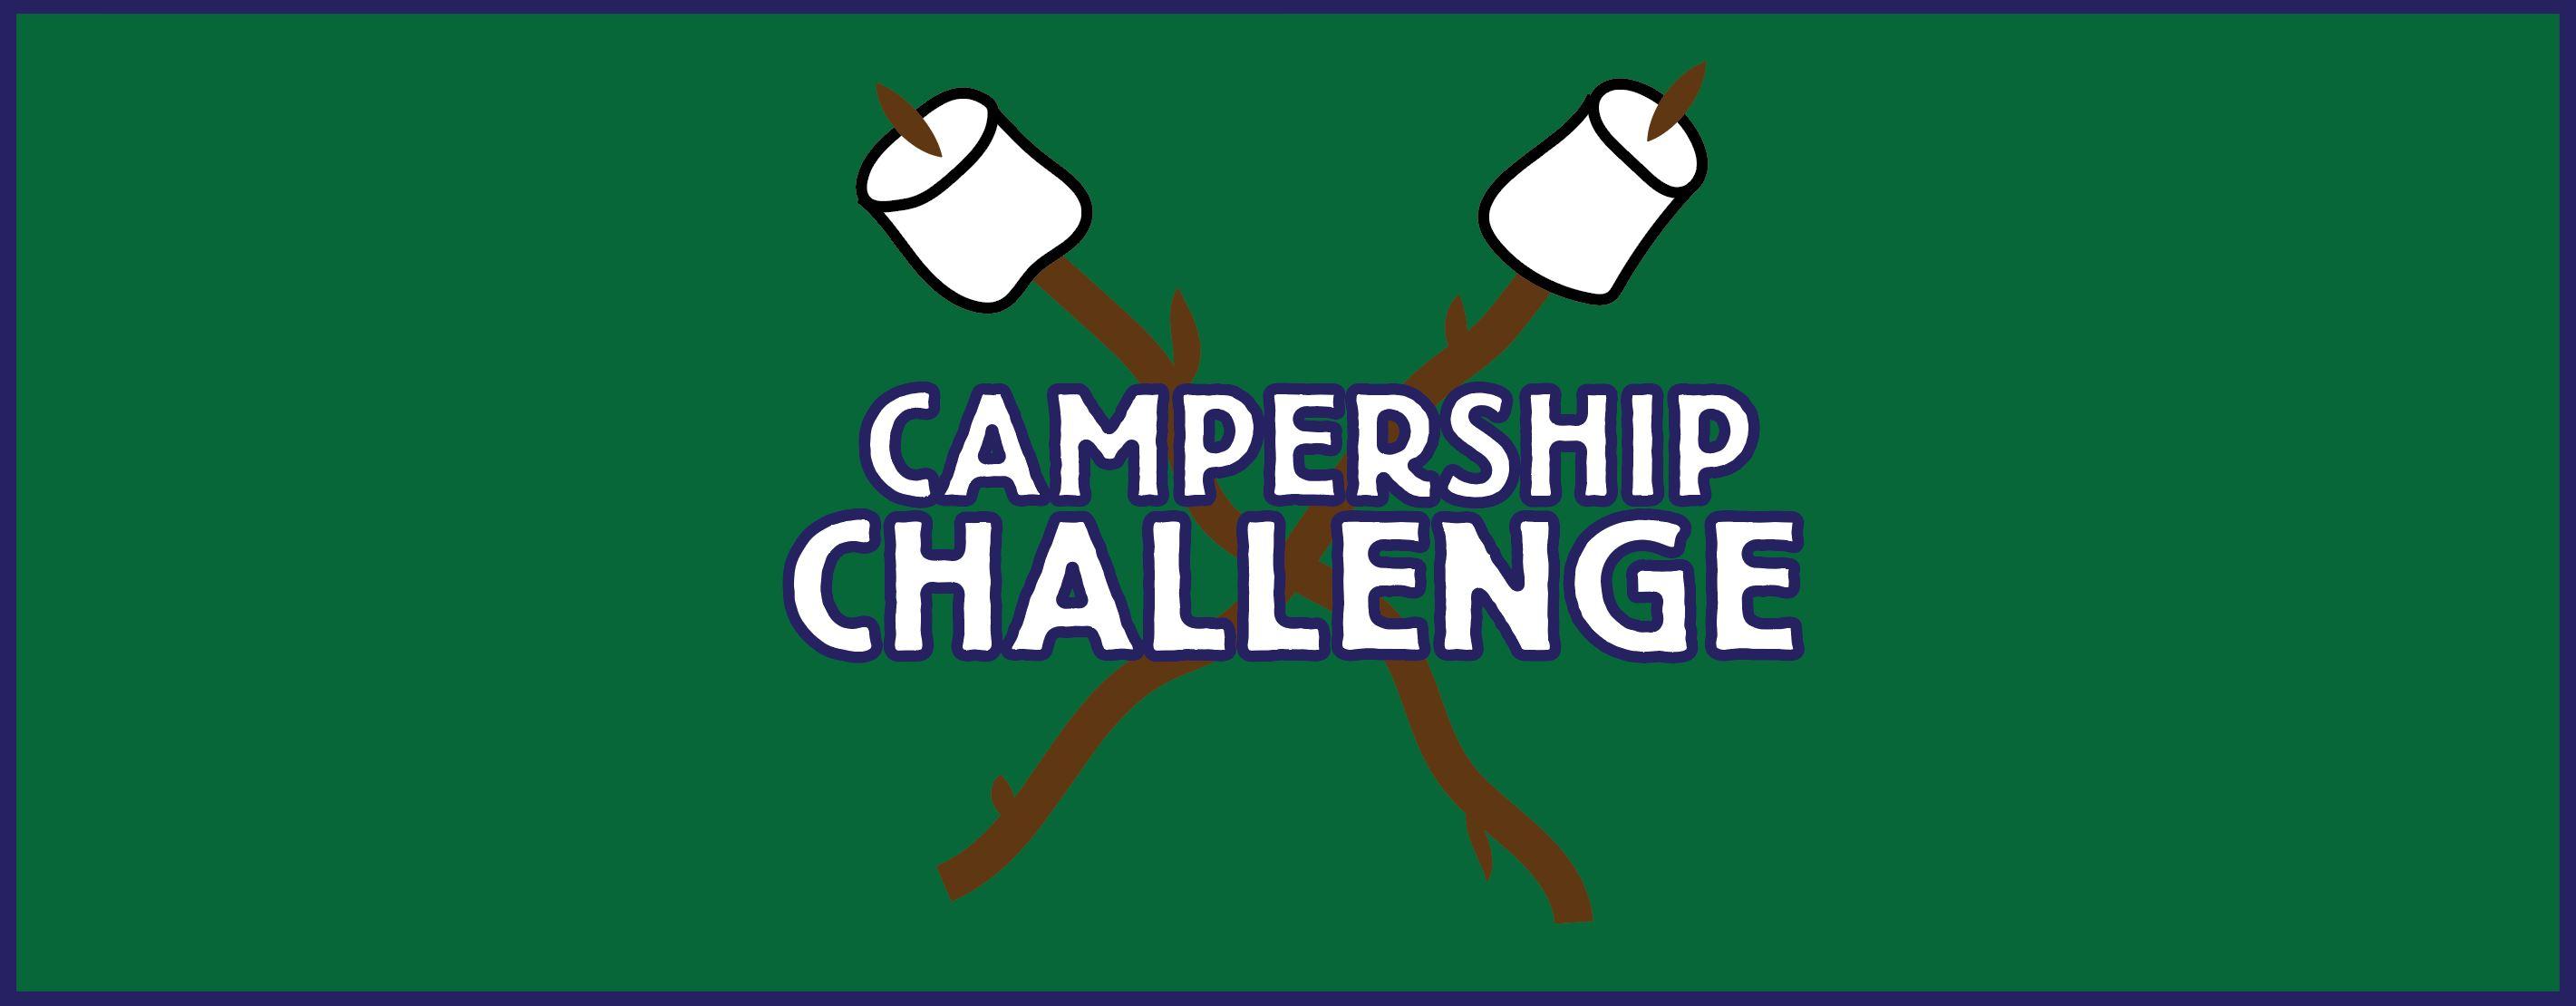 Campership Challenge